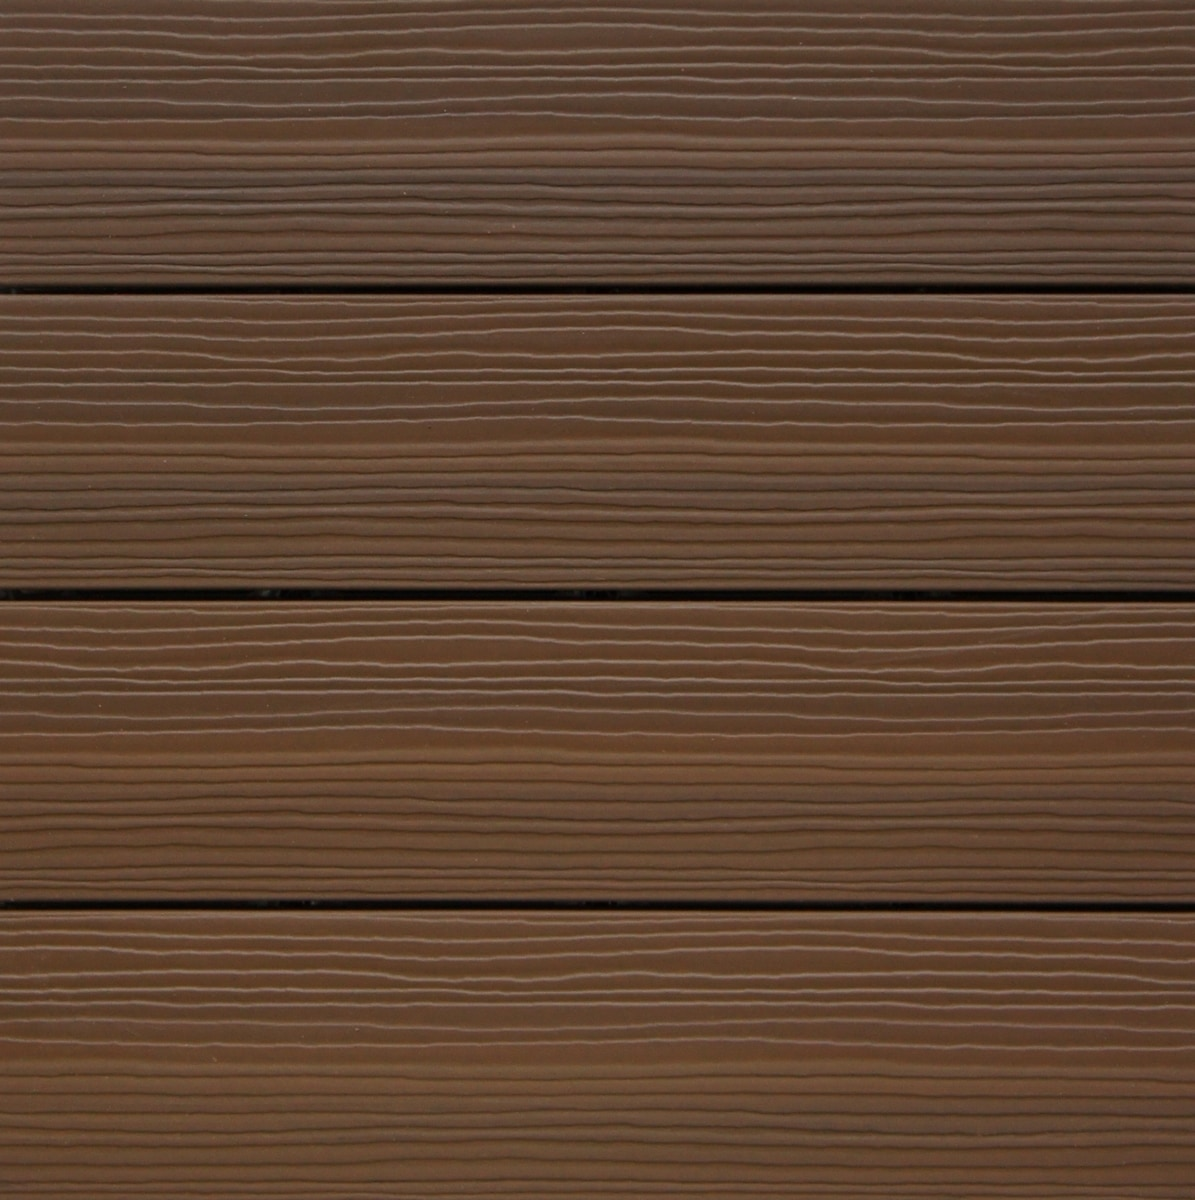 Kontiki interlocking deck tiles composite quickdeck series ipe 12 x12 x1 - How to install interlocking deck tiles ...